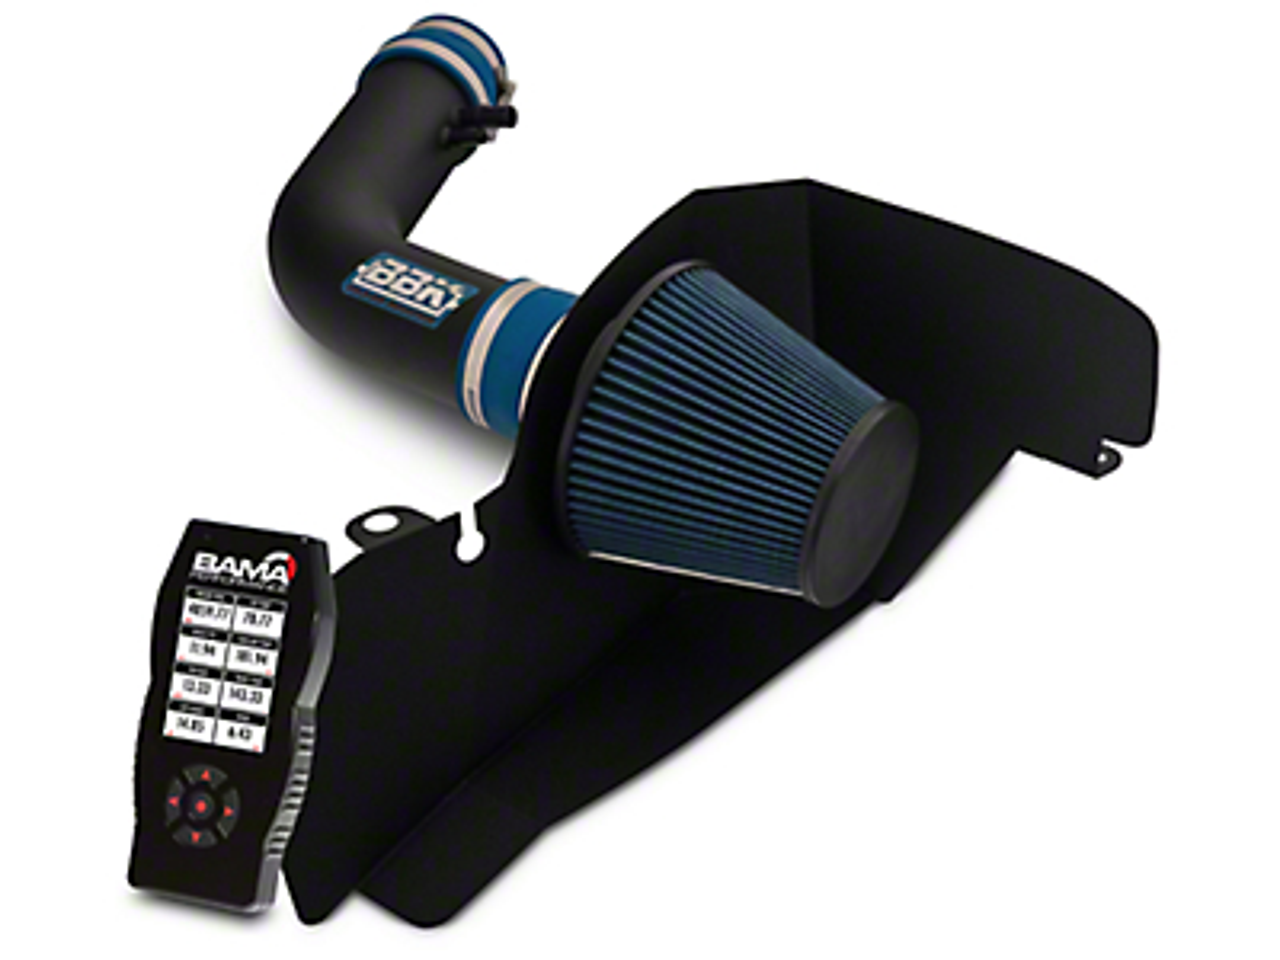 BBK Blackout Cold Air Intake and BAMA X4 Tuner (15-17 V6)